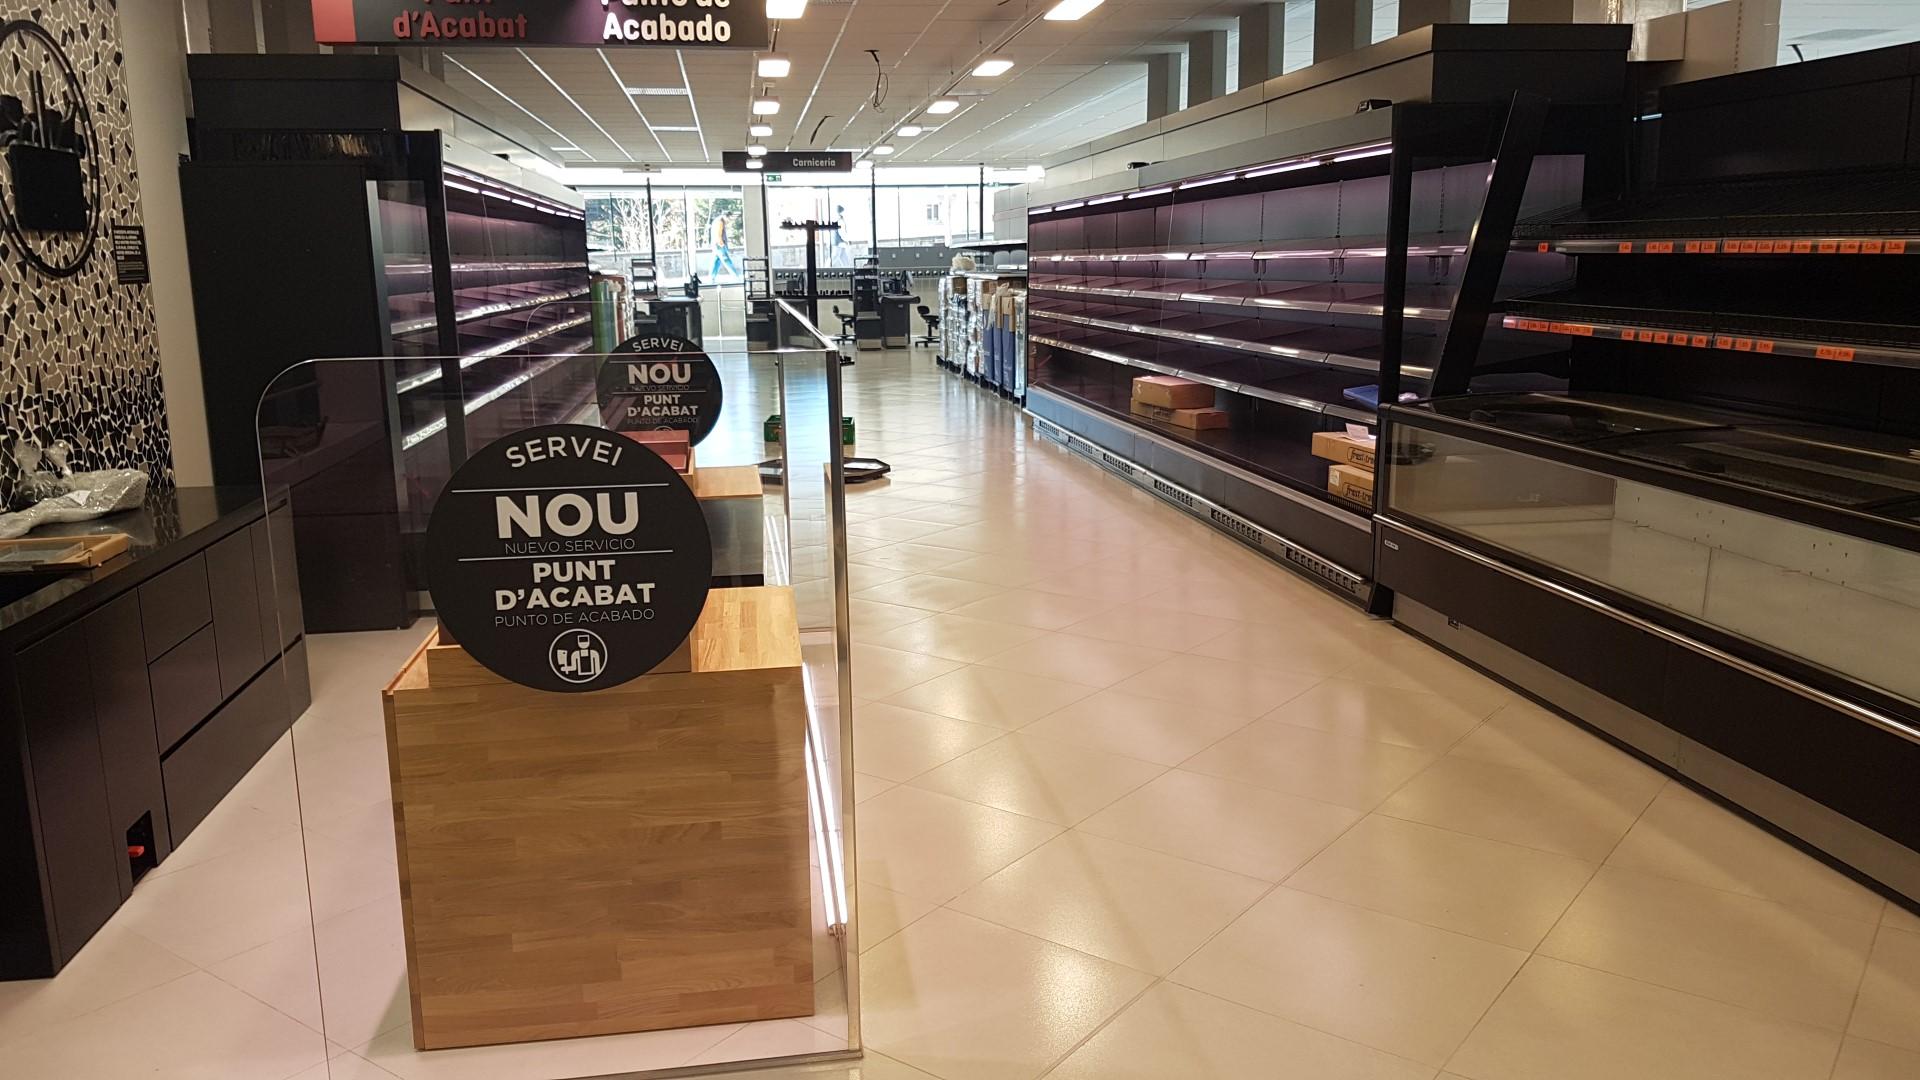 Montaje supermercado mercadona muebles frigor ficos for Mercadona oficinas centrales